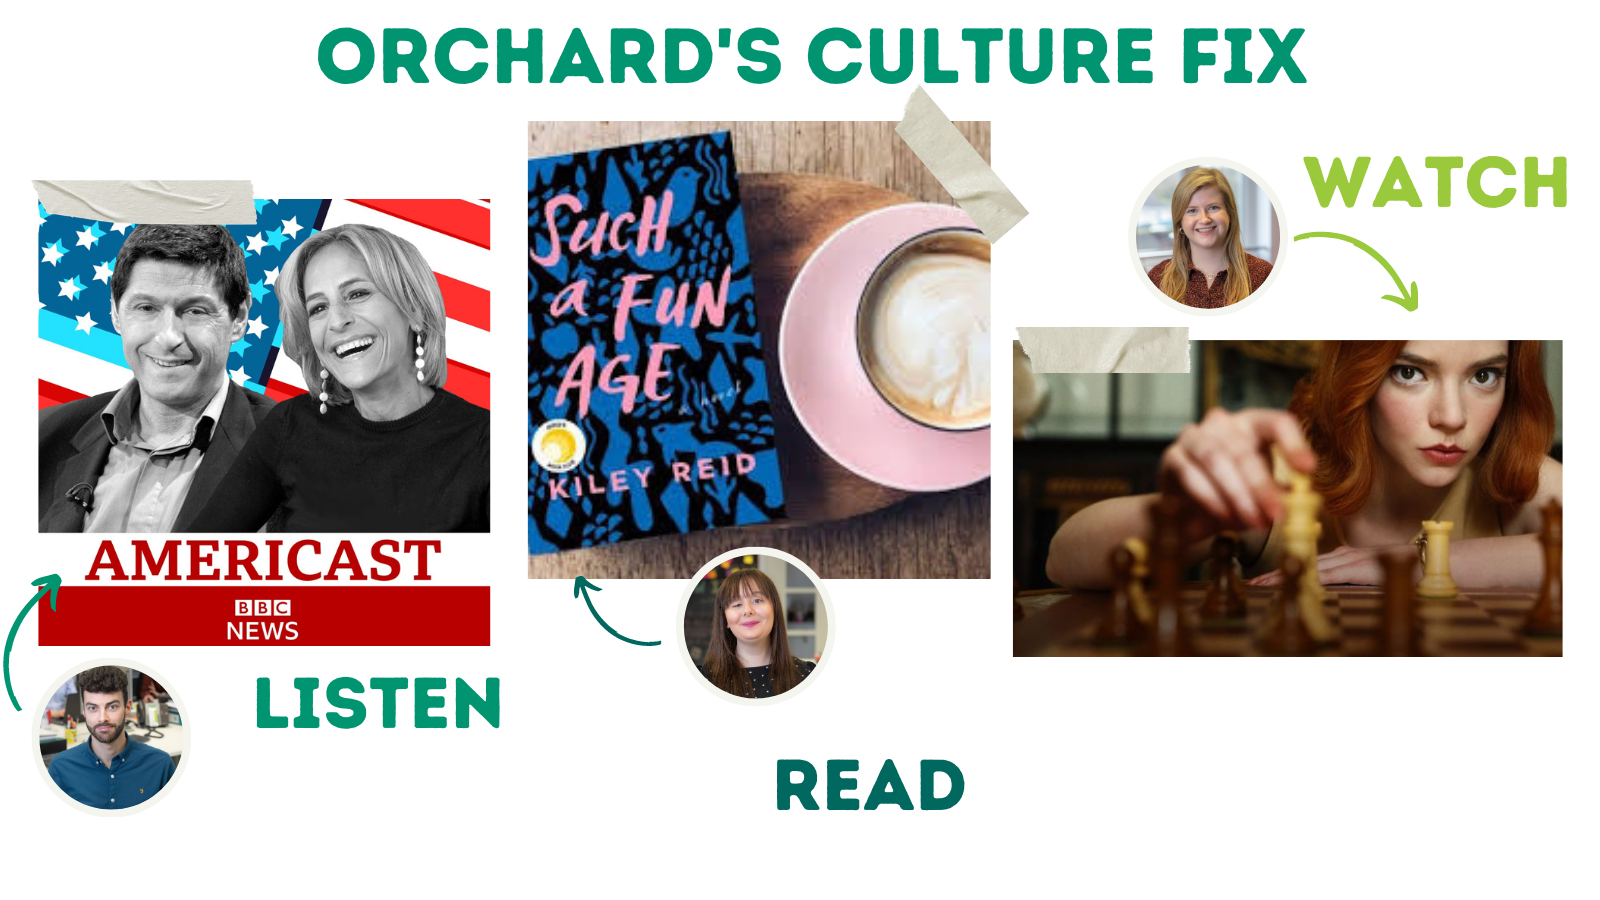 Orchard's culture fix #1